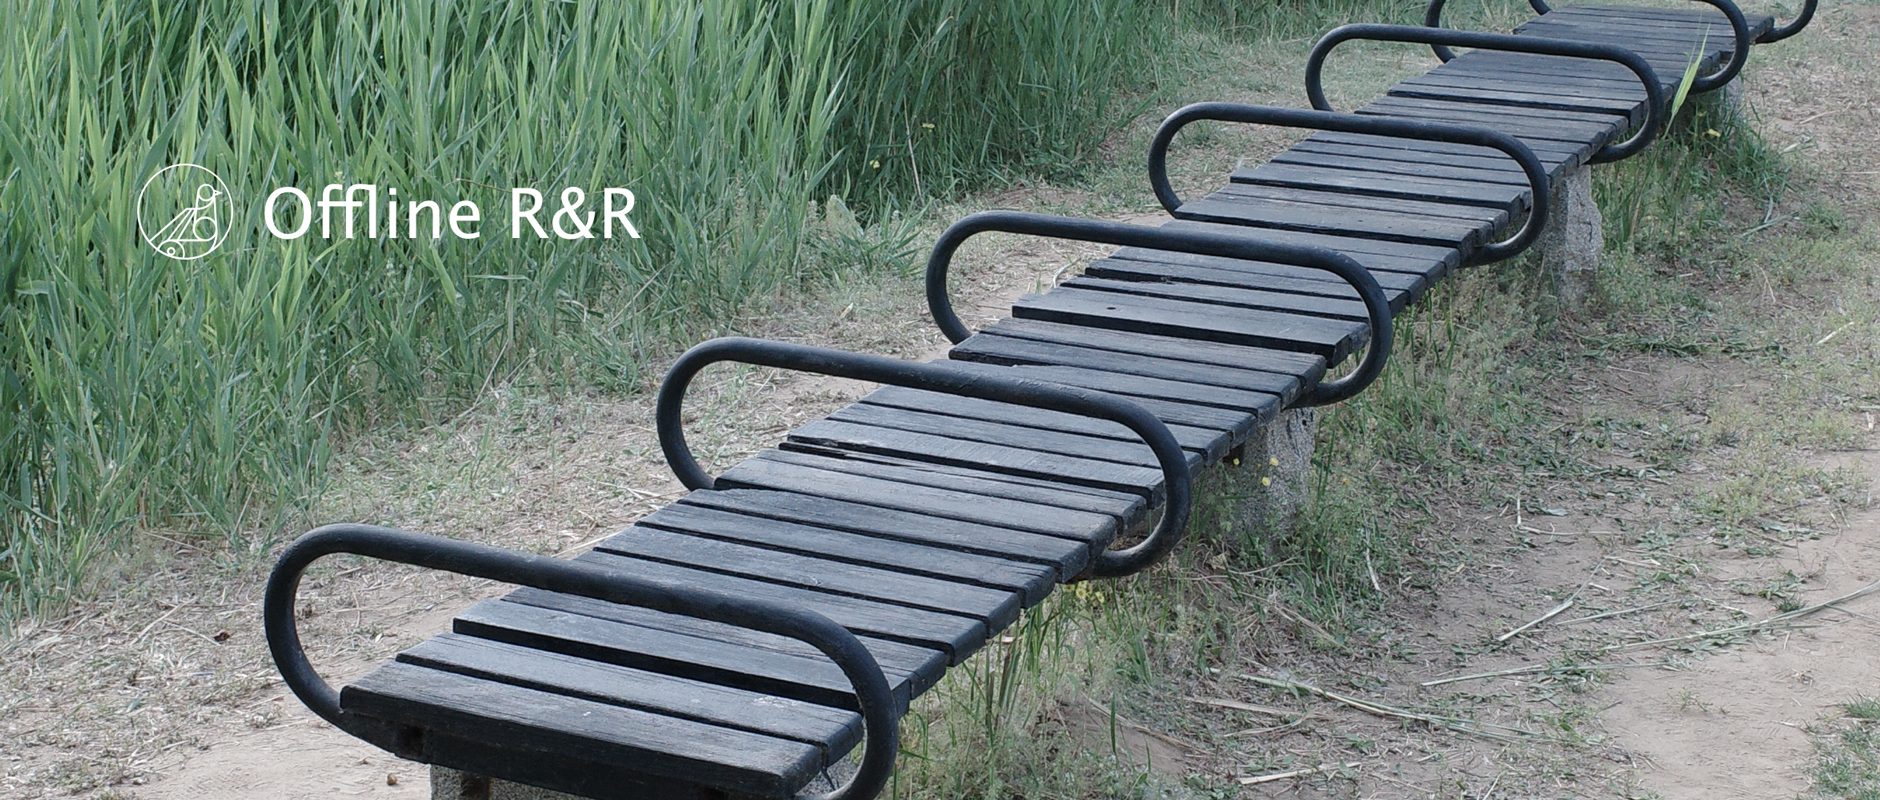 Read & Review 002 公共空间的敌意和善意